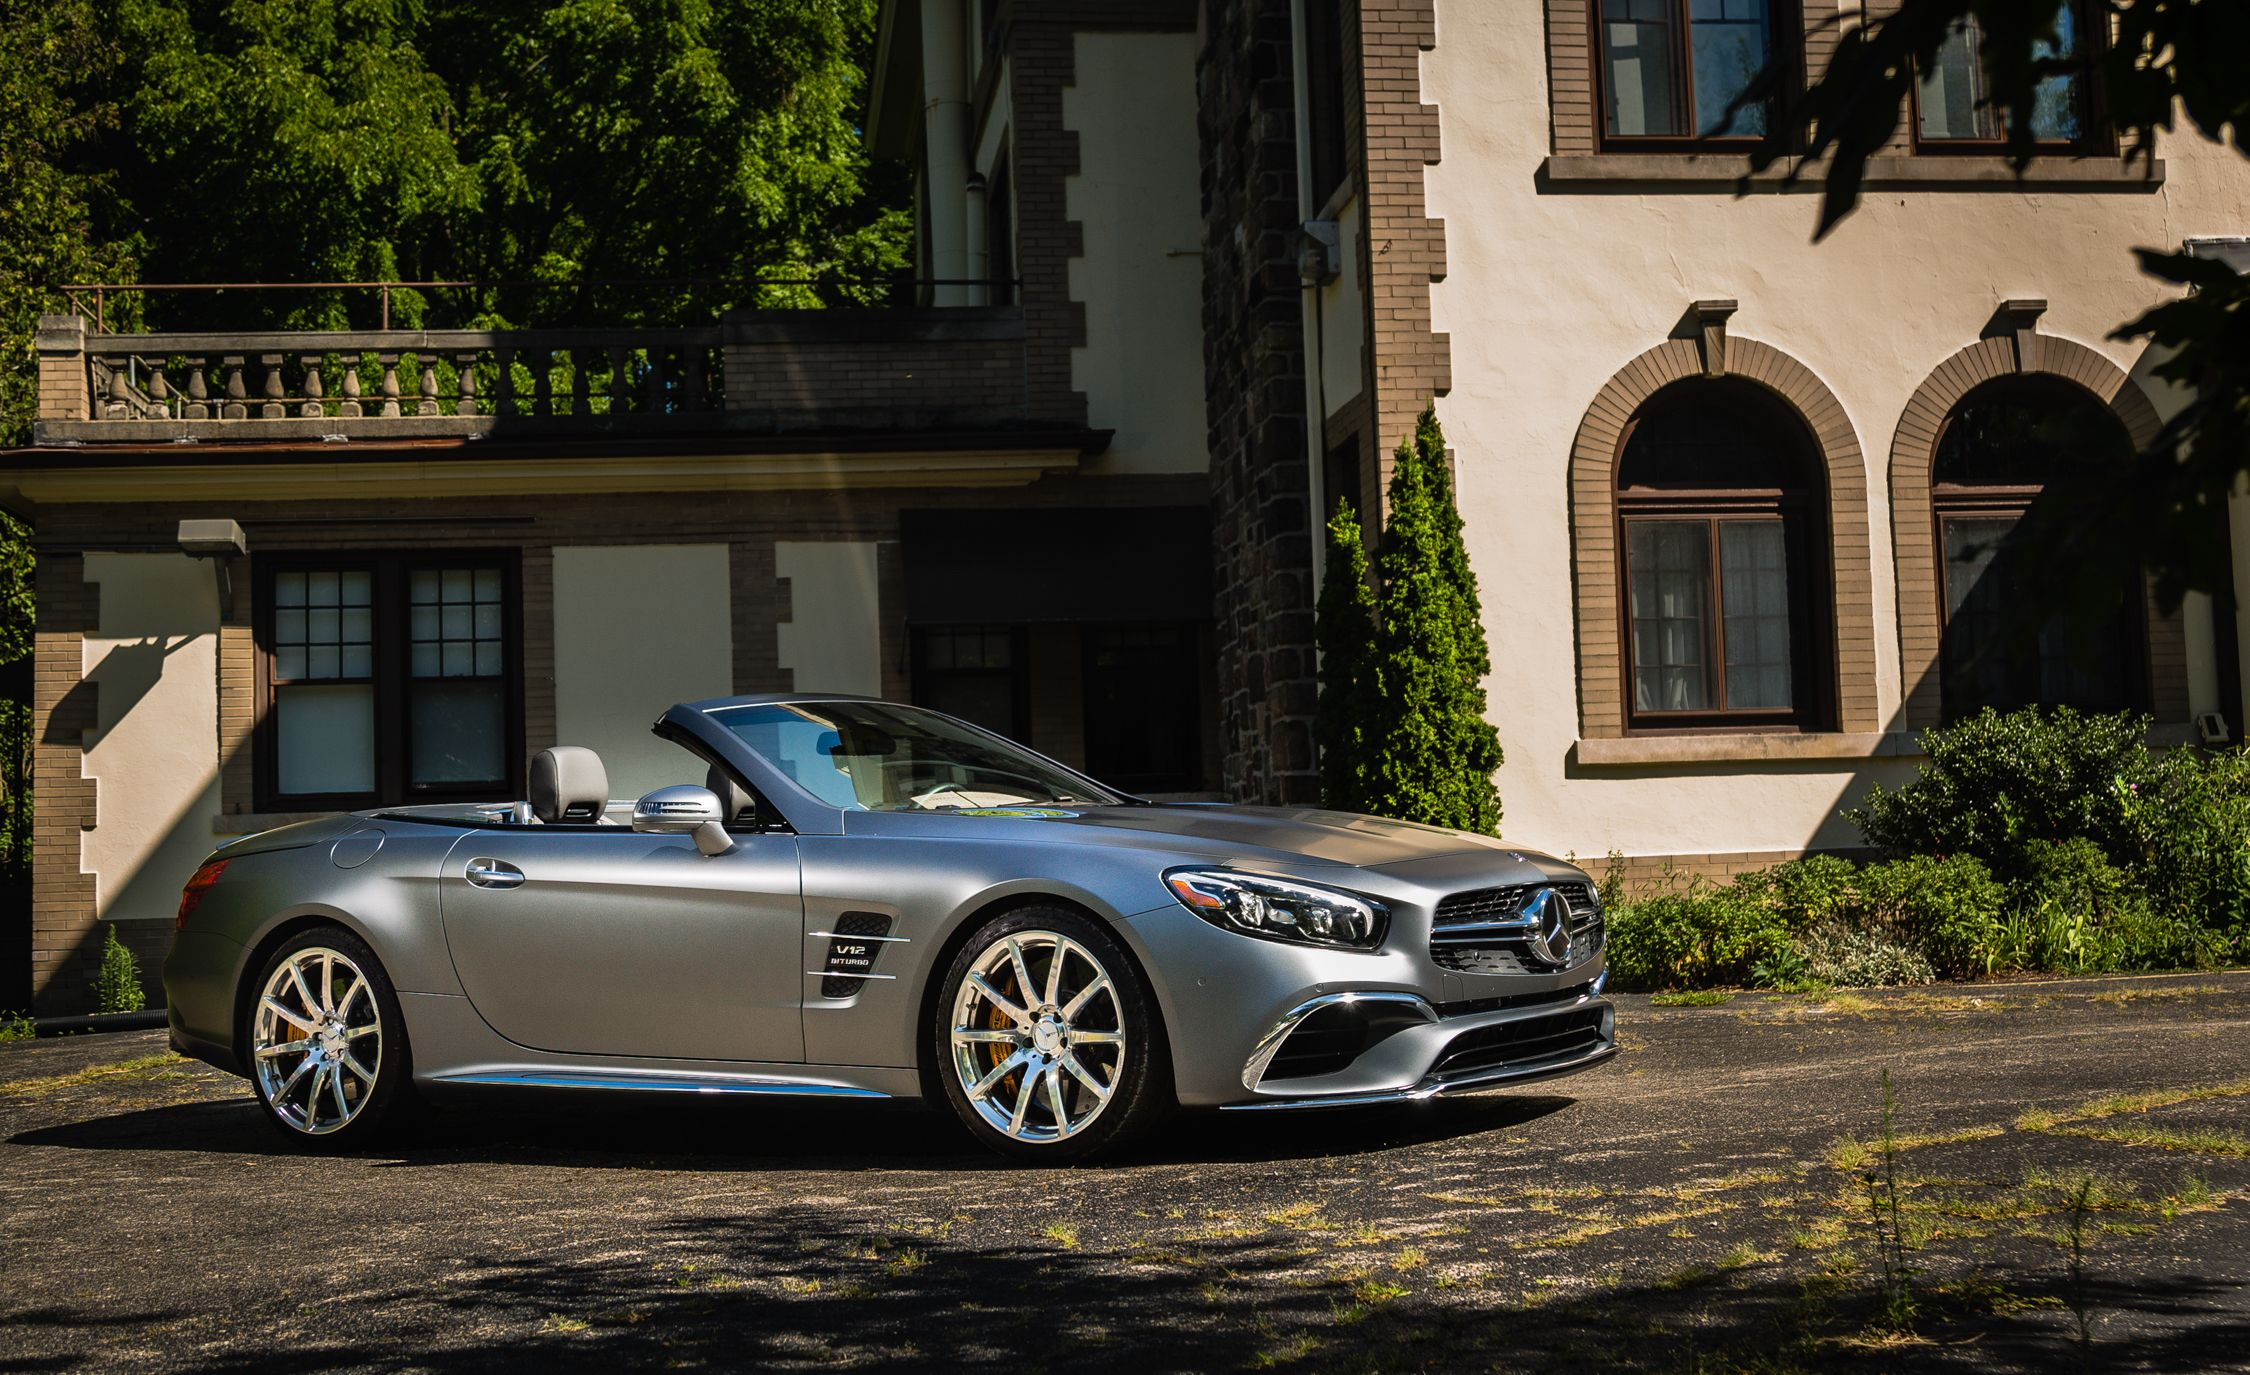 https://hips.hearstapps.com/amv-prod-cad-assets.s3.amazonaws.com/wp-content/uploads/2016/08/2017-Mercedes-AMG-SL65-119.jpg